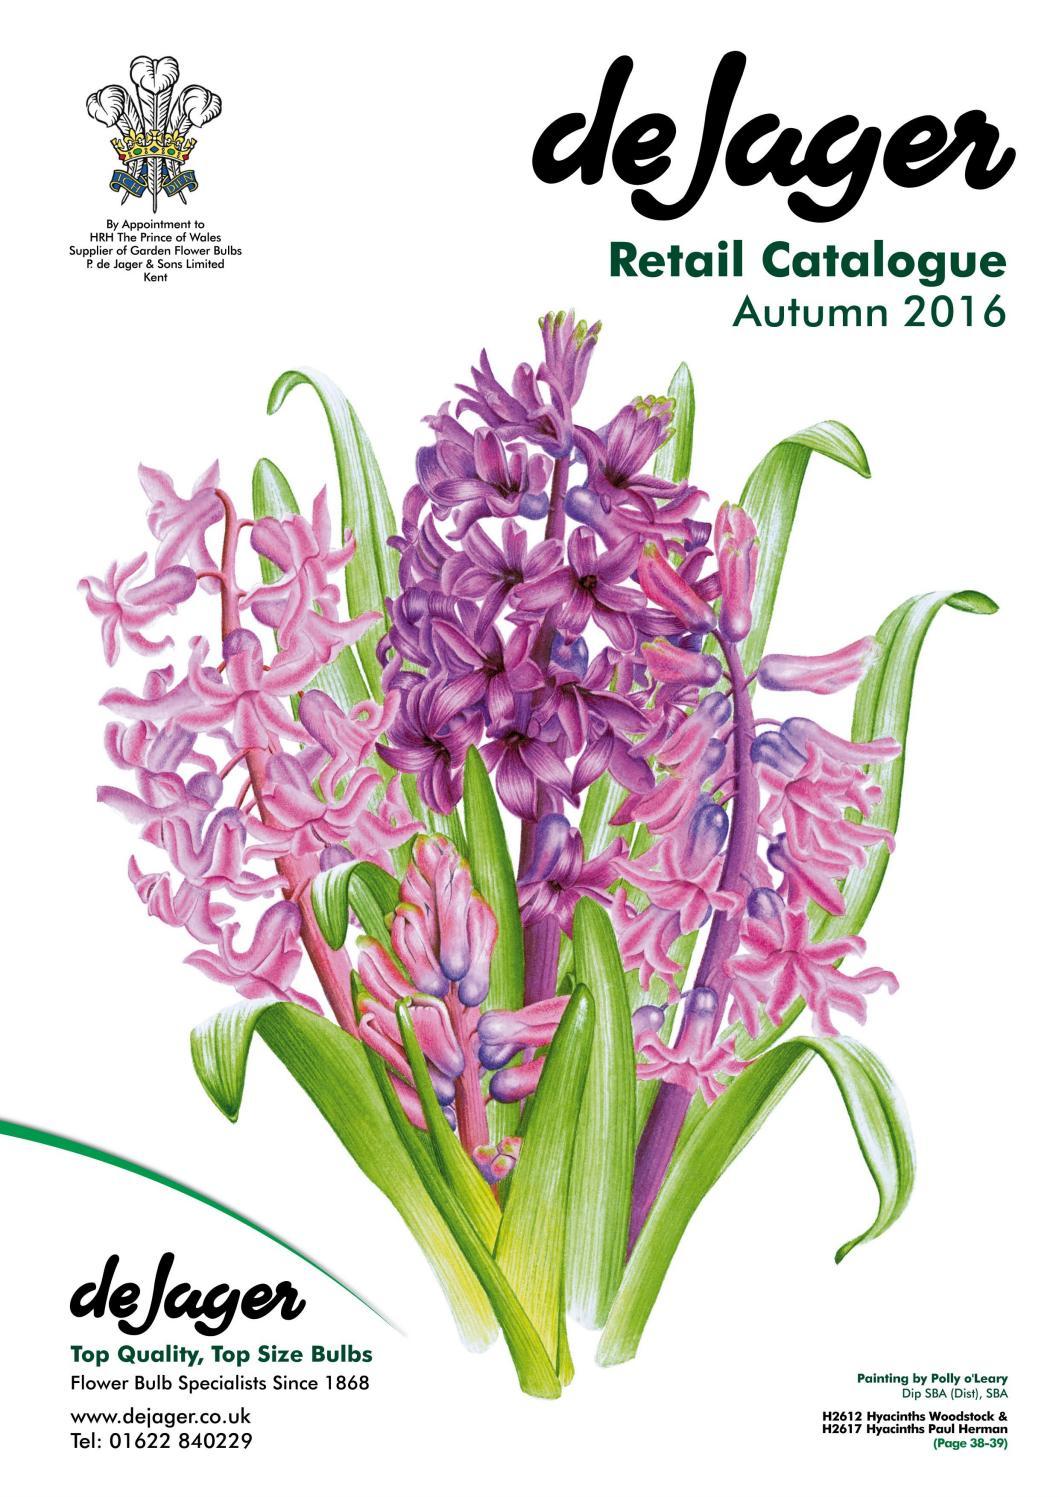 De jager bulbs retail catalogue autumn 2016 by emma simpson issuu mightylinksfo